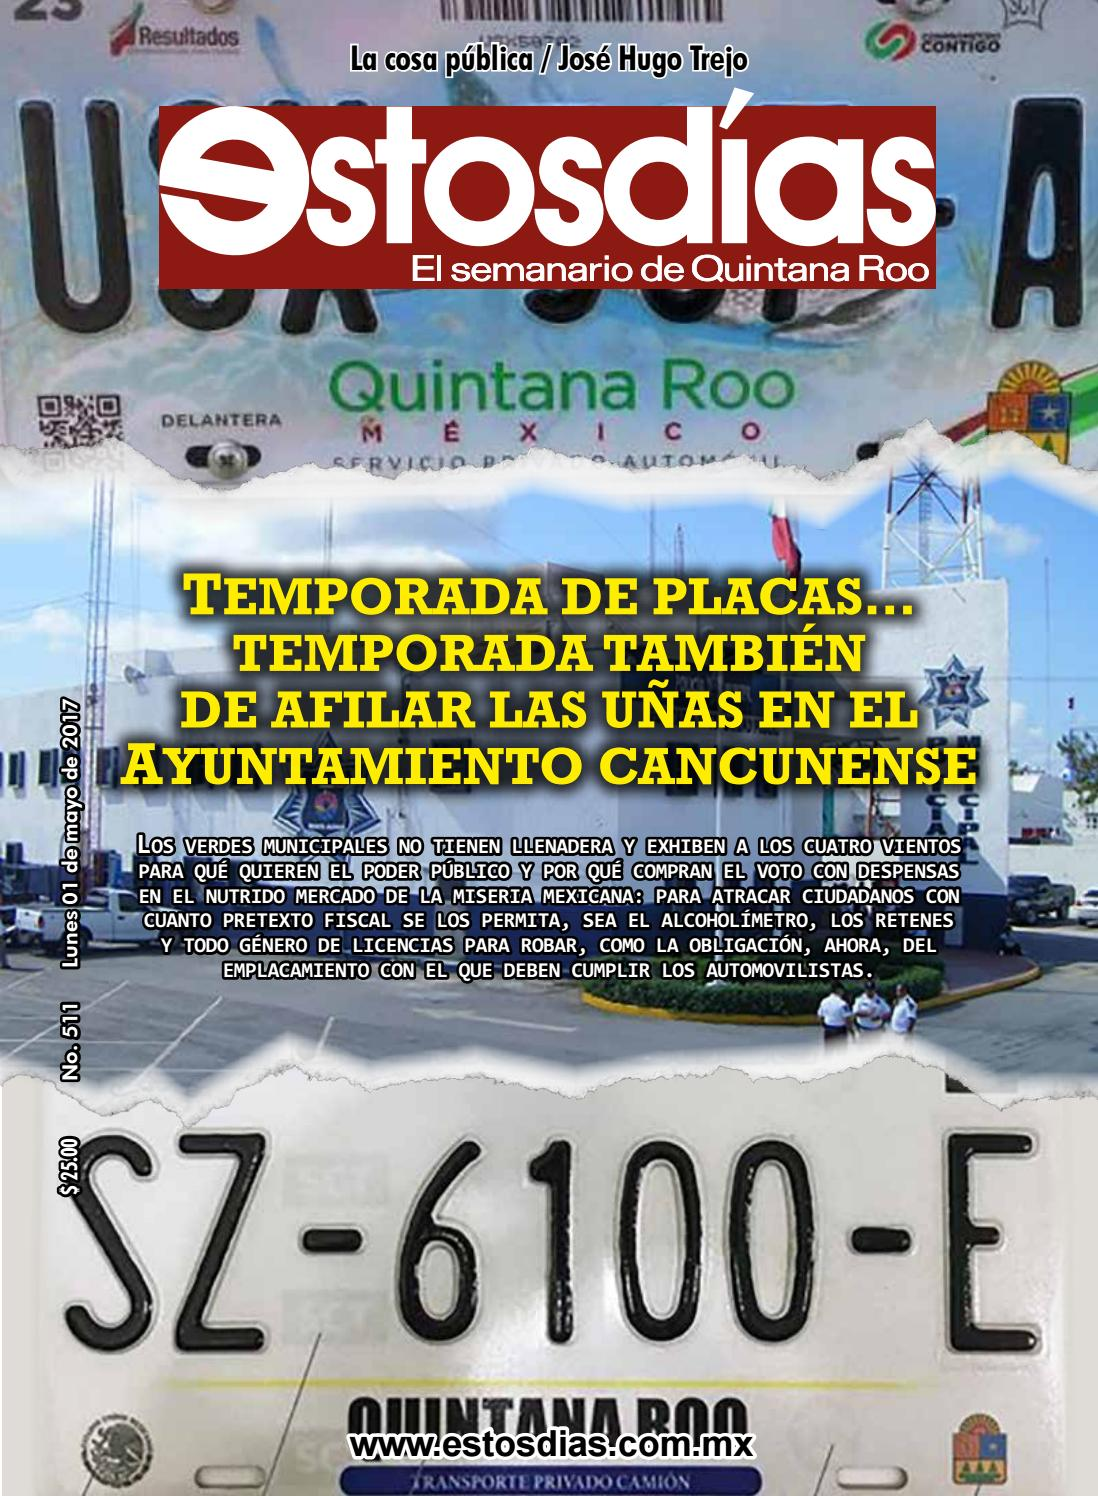 Estosdías N° 511 by Estosdías S.A de C.V. - issuu